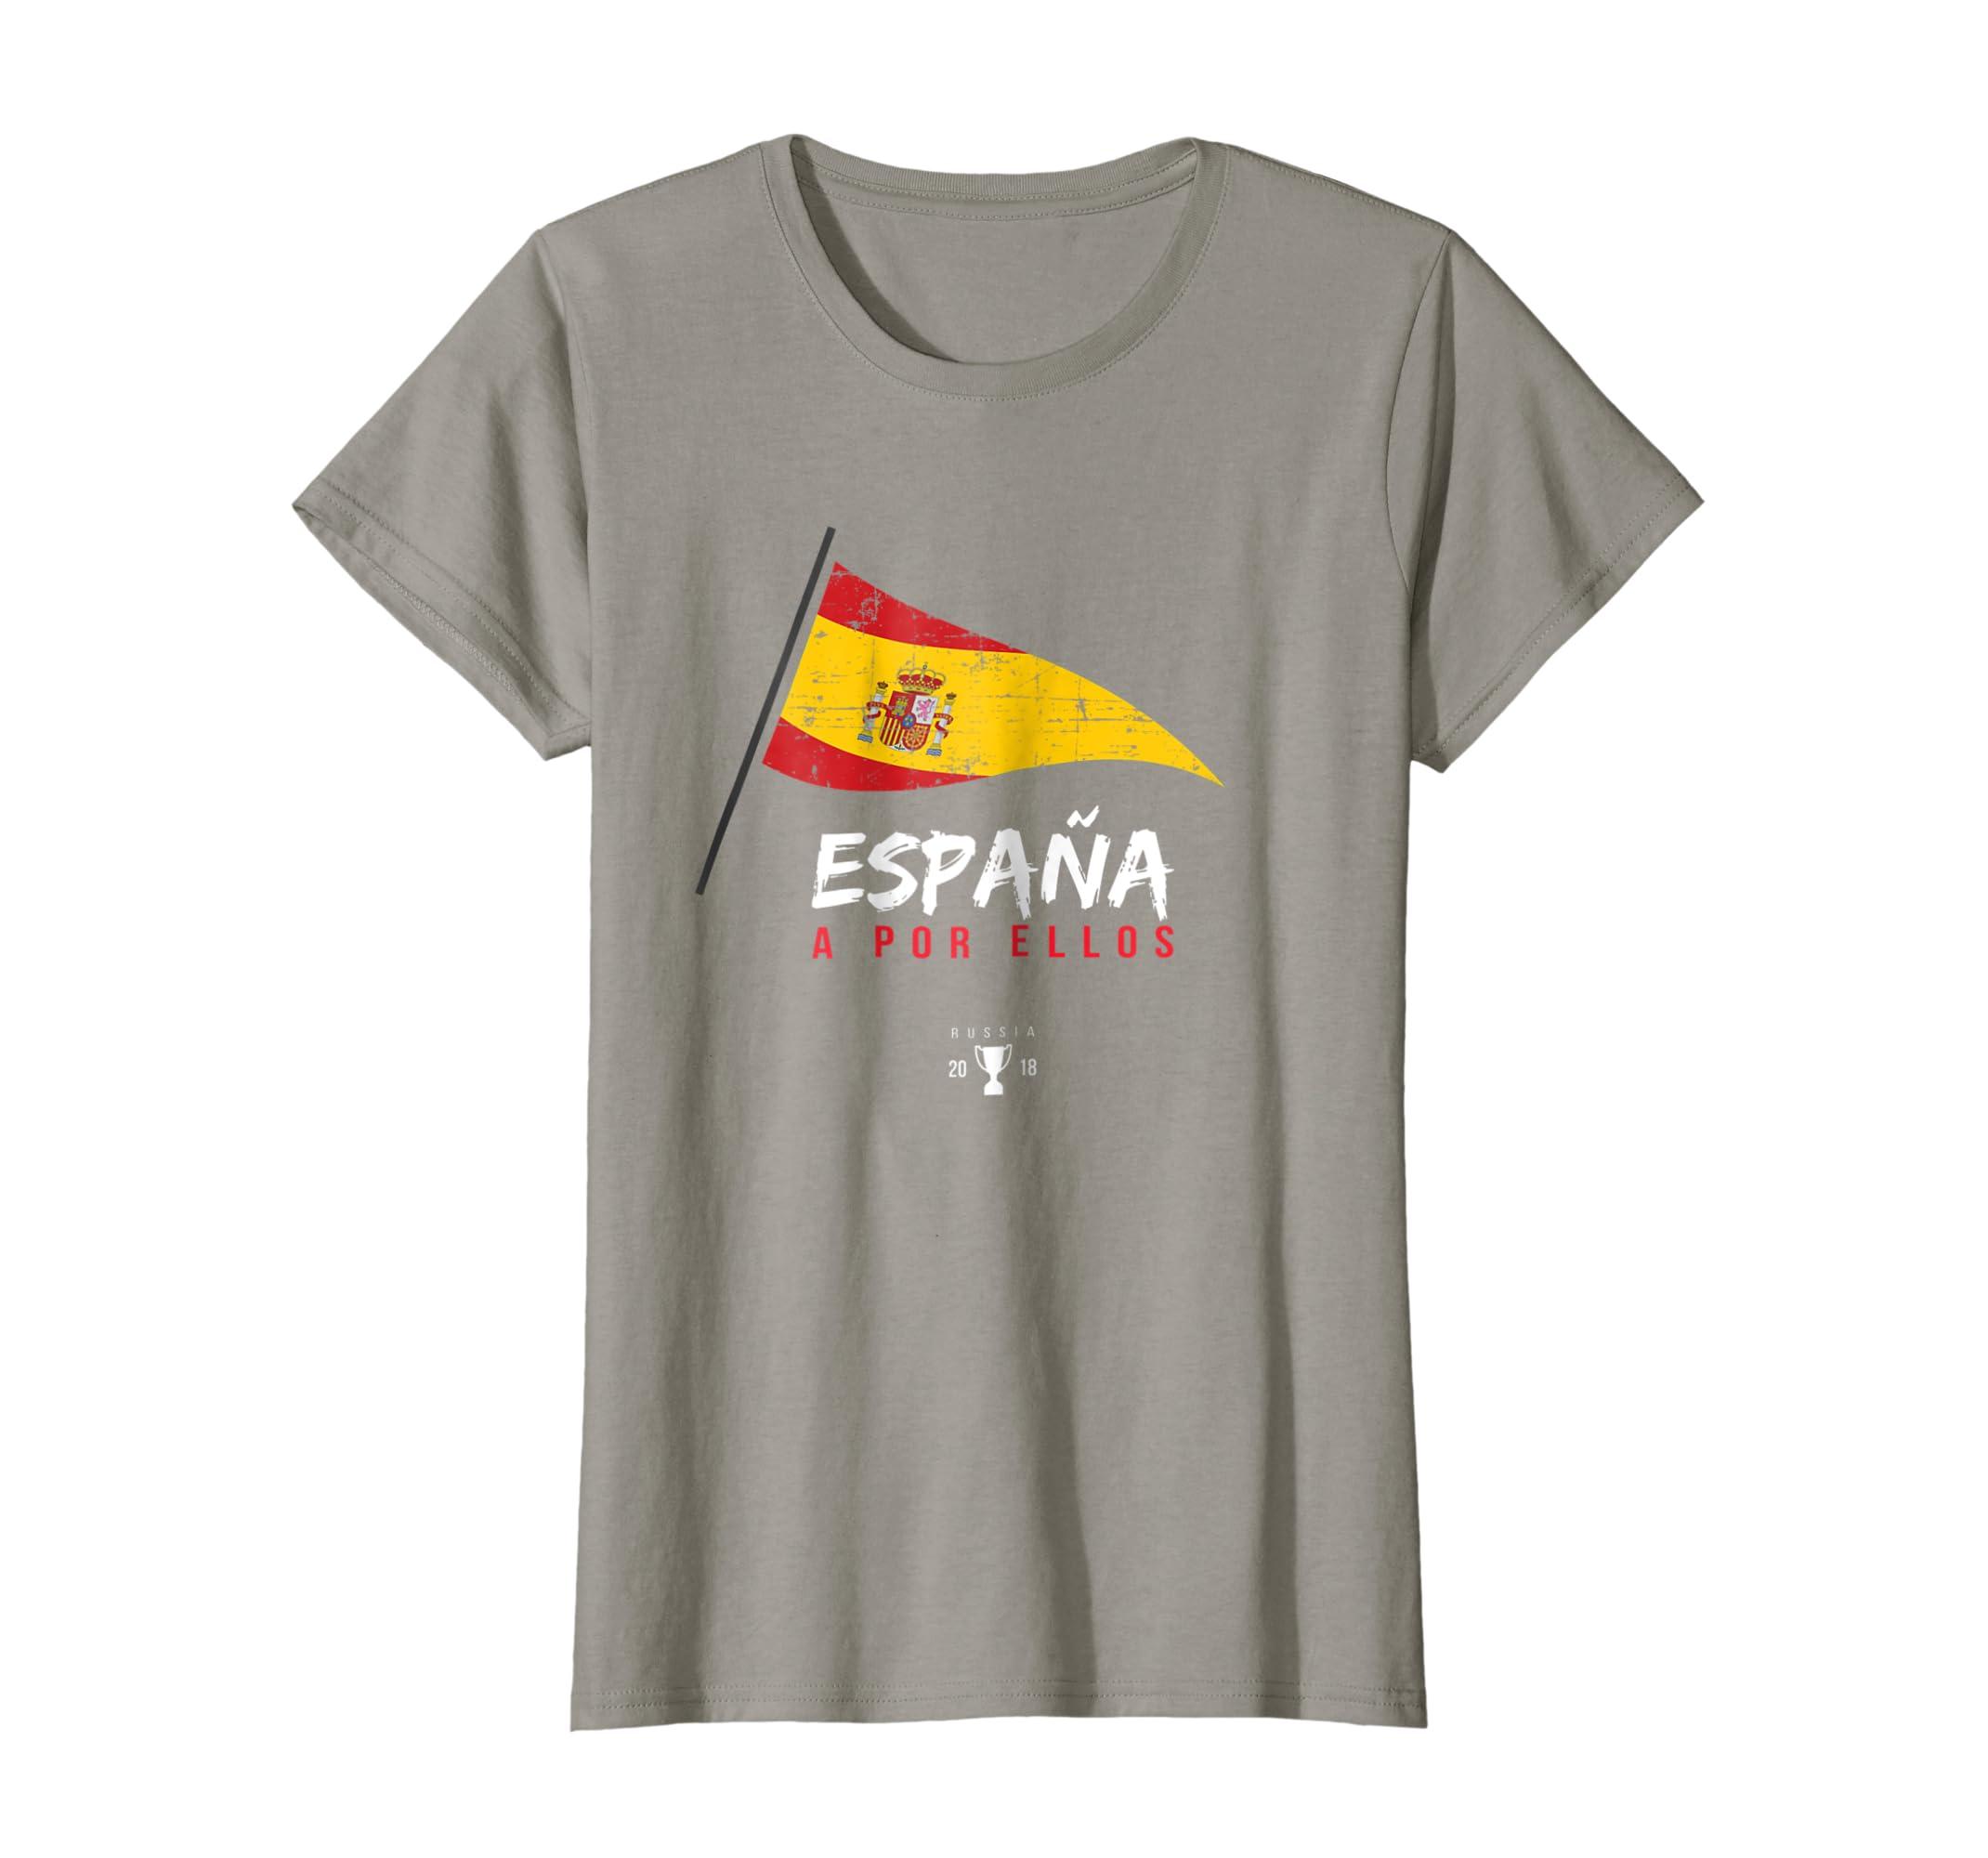 9c1ec18c8d2d8f Amazon.com  Spain Soccer Shirt 2018 Football Team Cup  Clothing